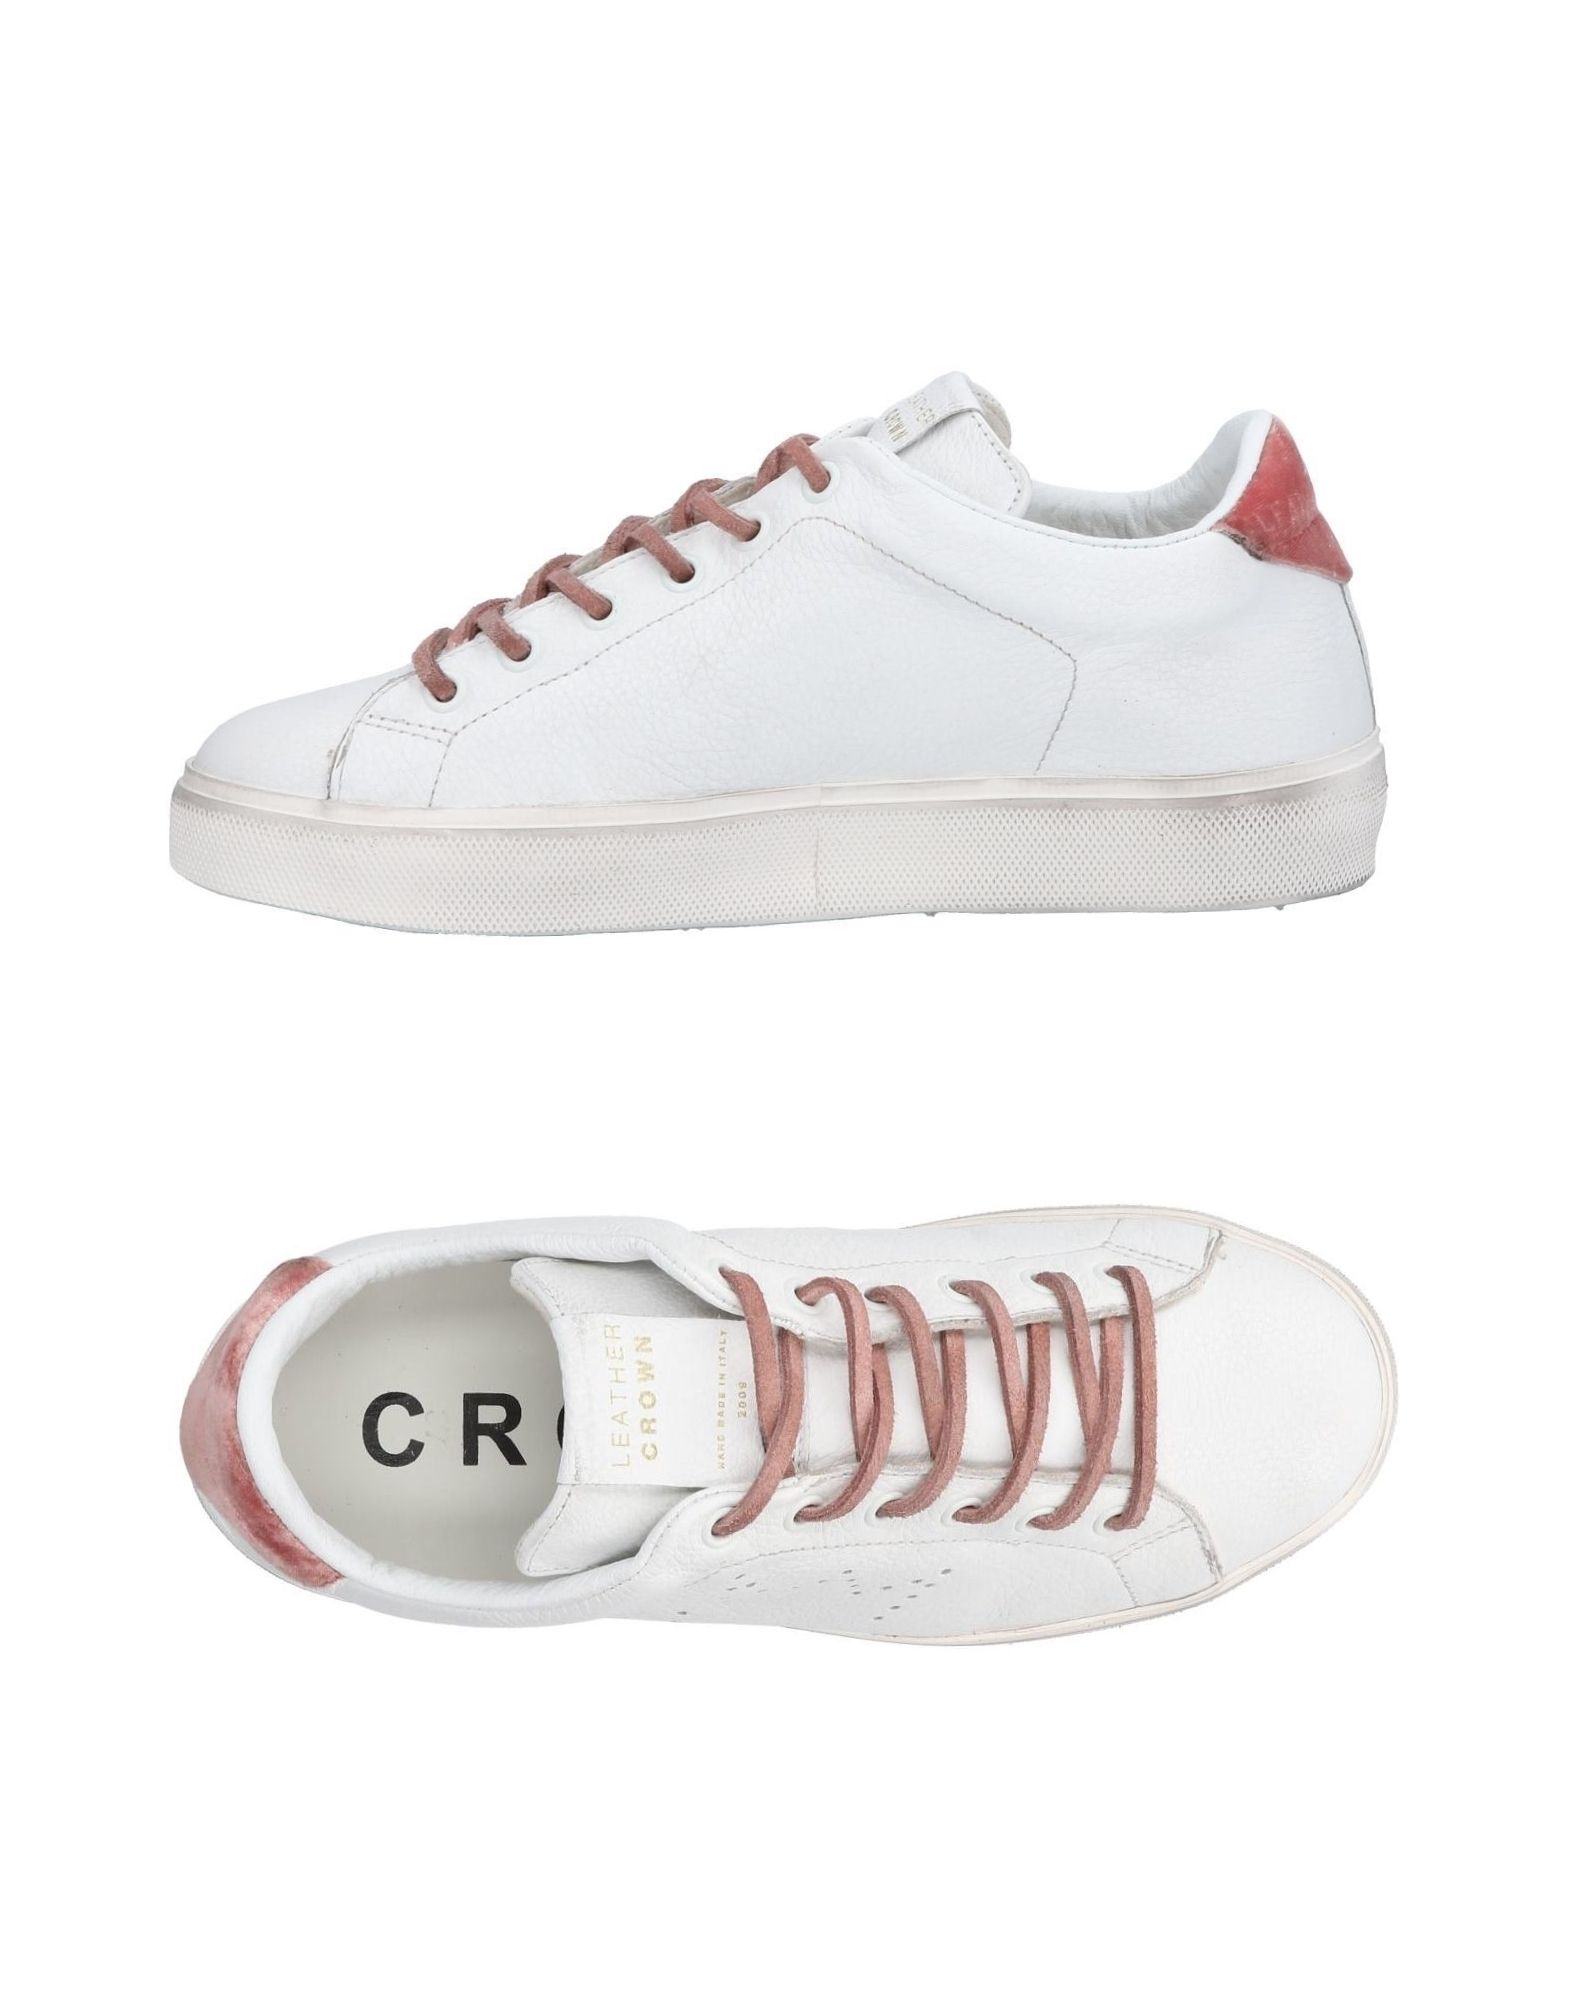 LEATHER CROWN Низкие кеды и кроссовки leather crown низкие кеды и кроссовки